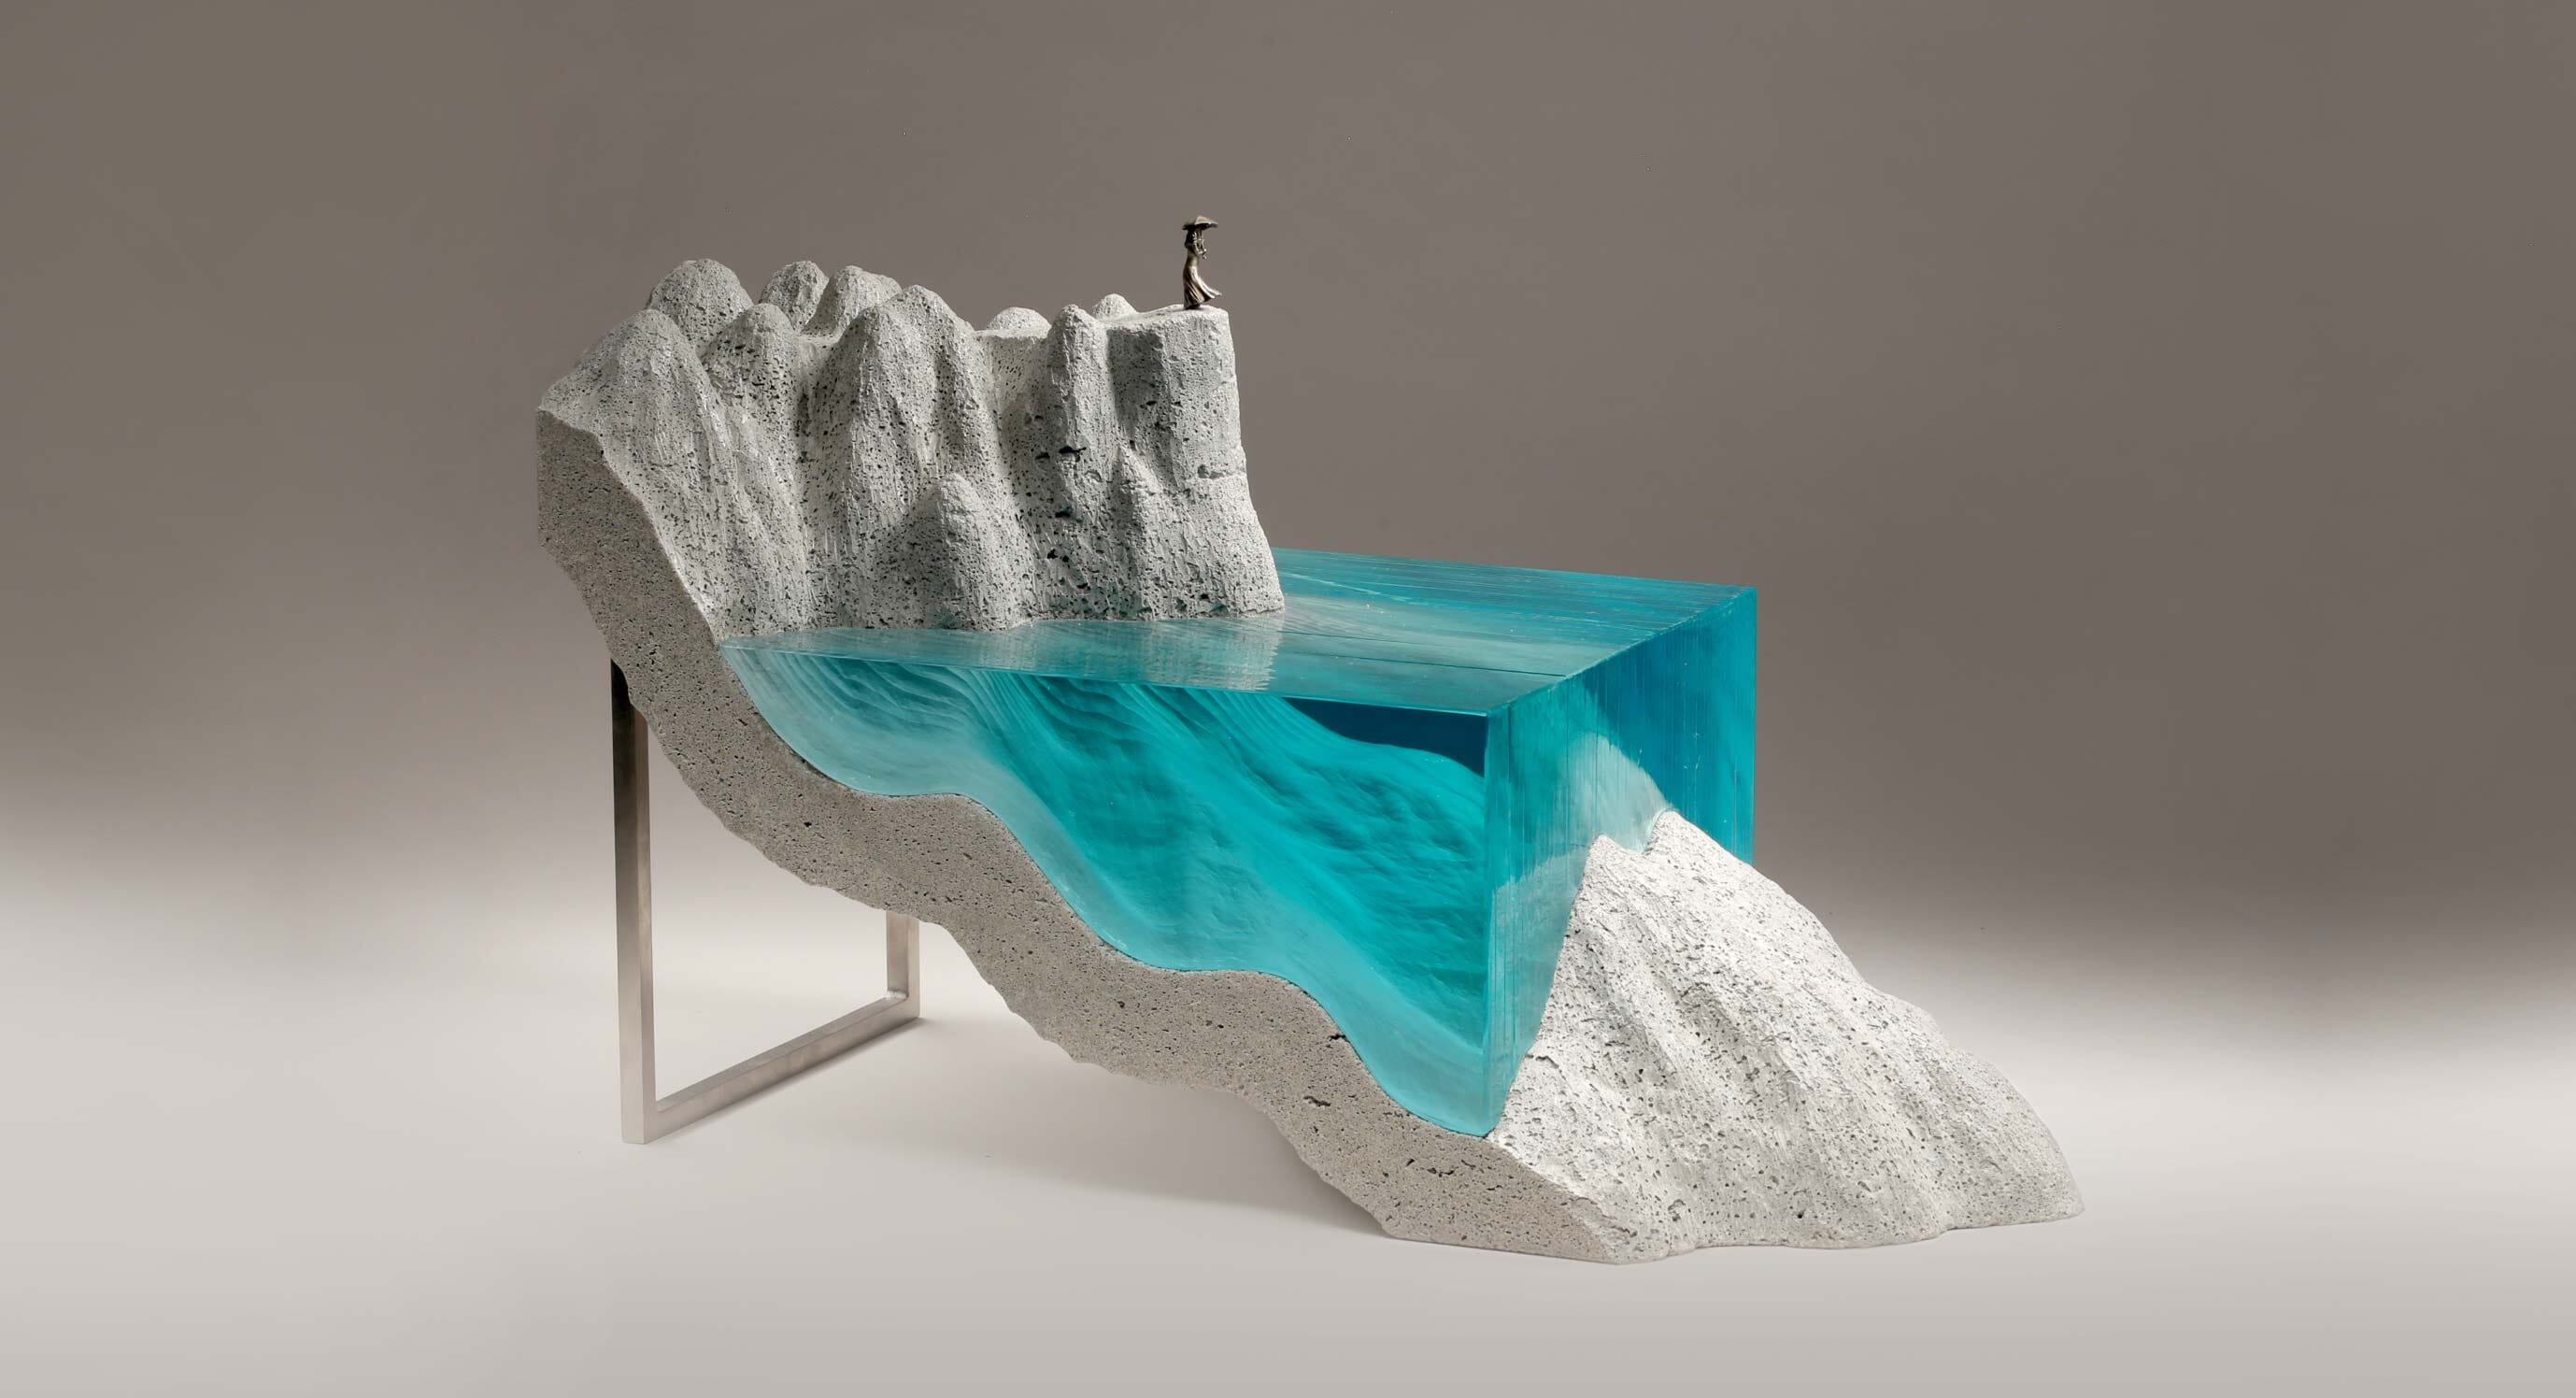 Who We're Following: Ben Young AKA @benyoung_sculpture